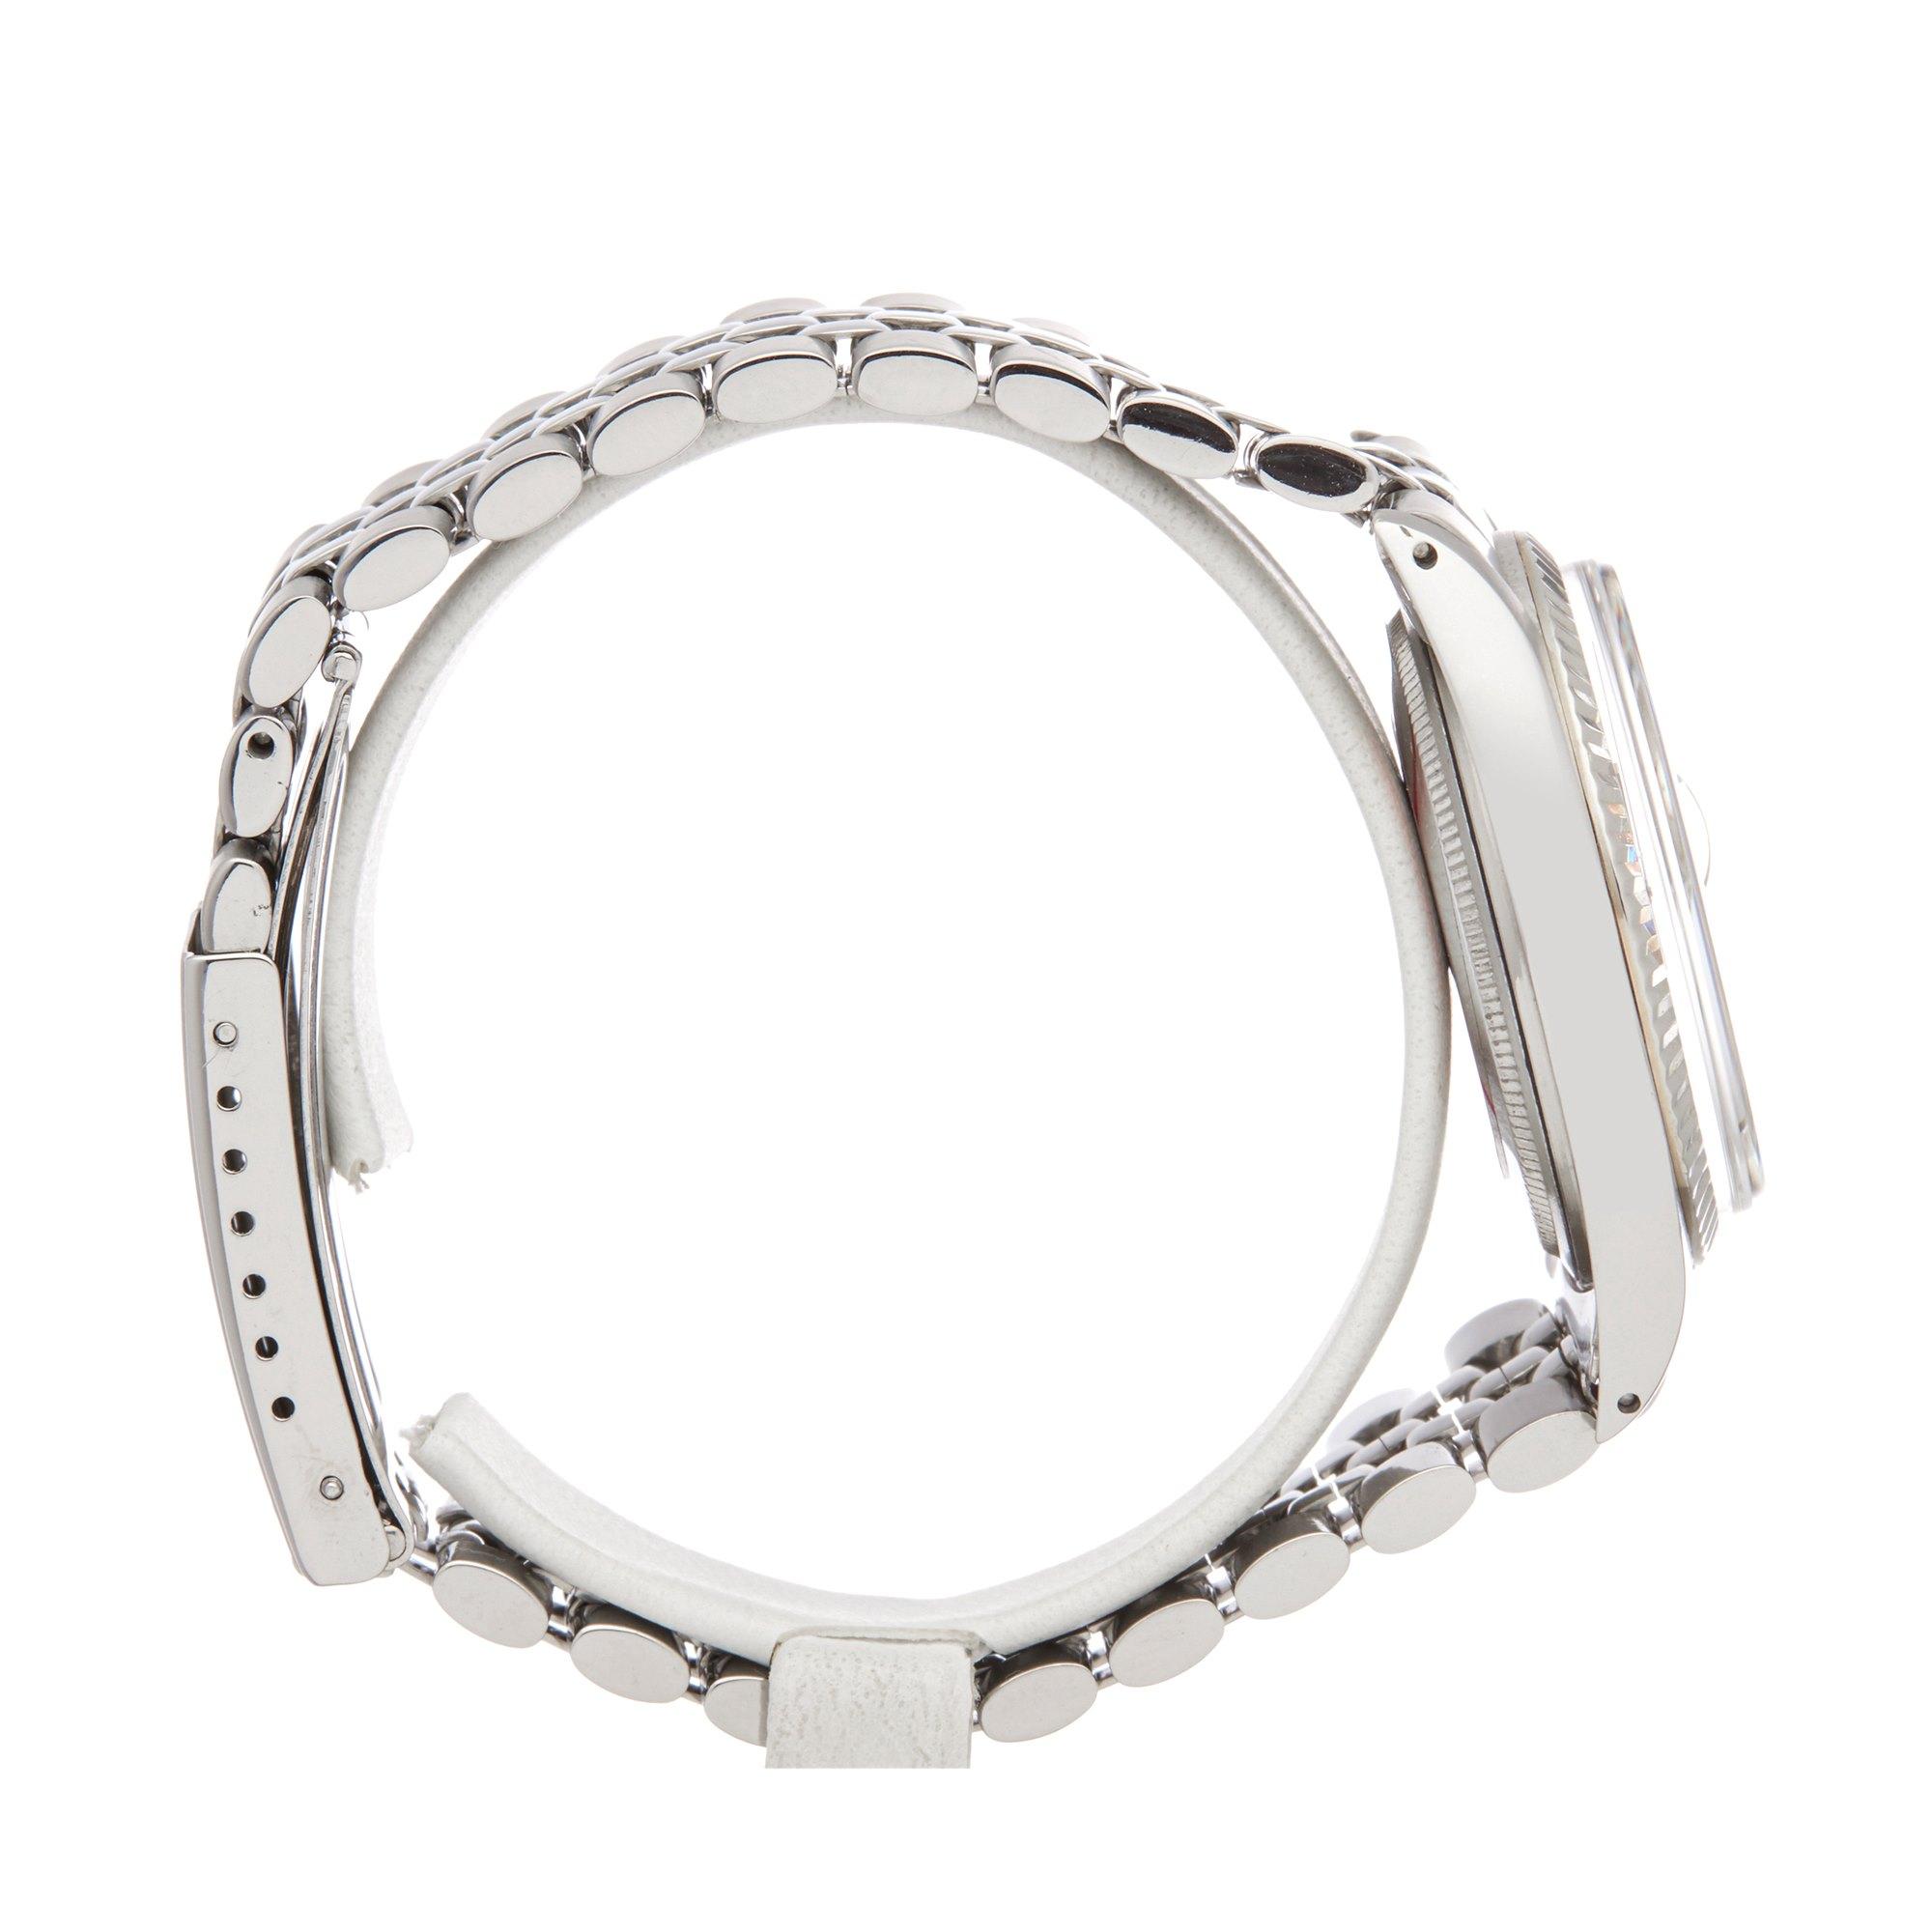 Rolex Datejust 36 Linen Dial Stainless Steel 1601